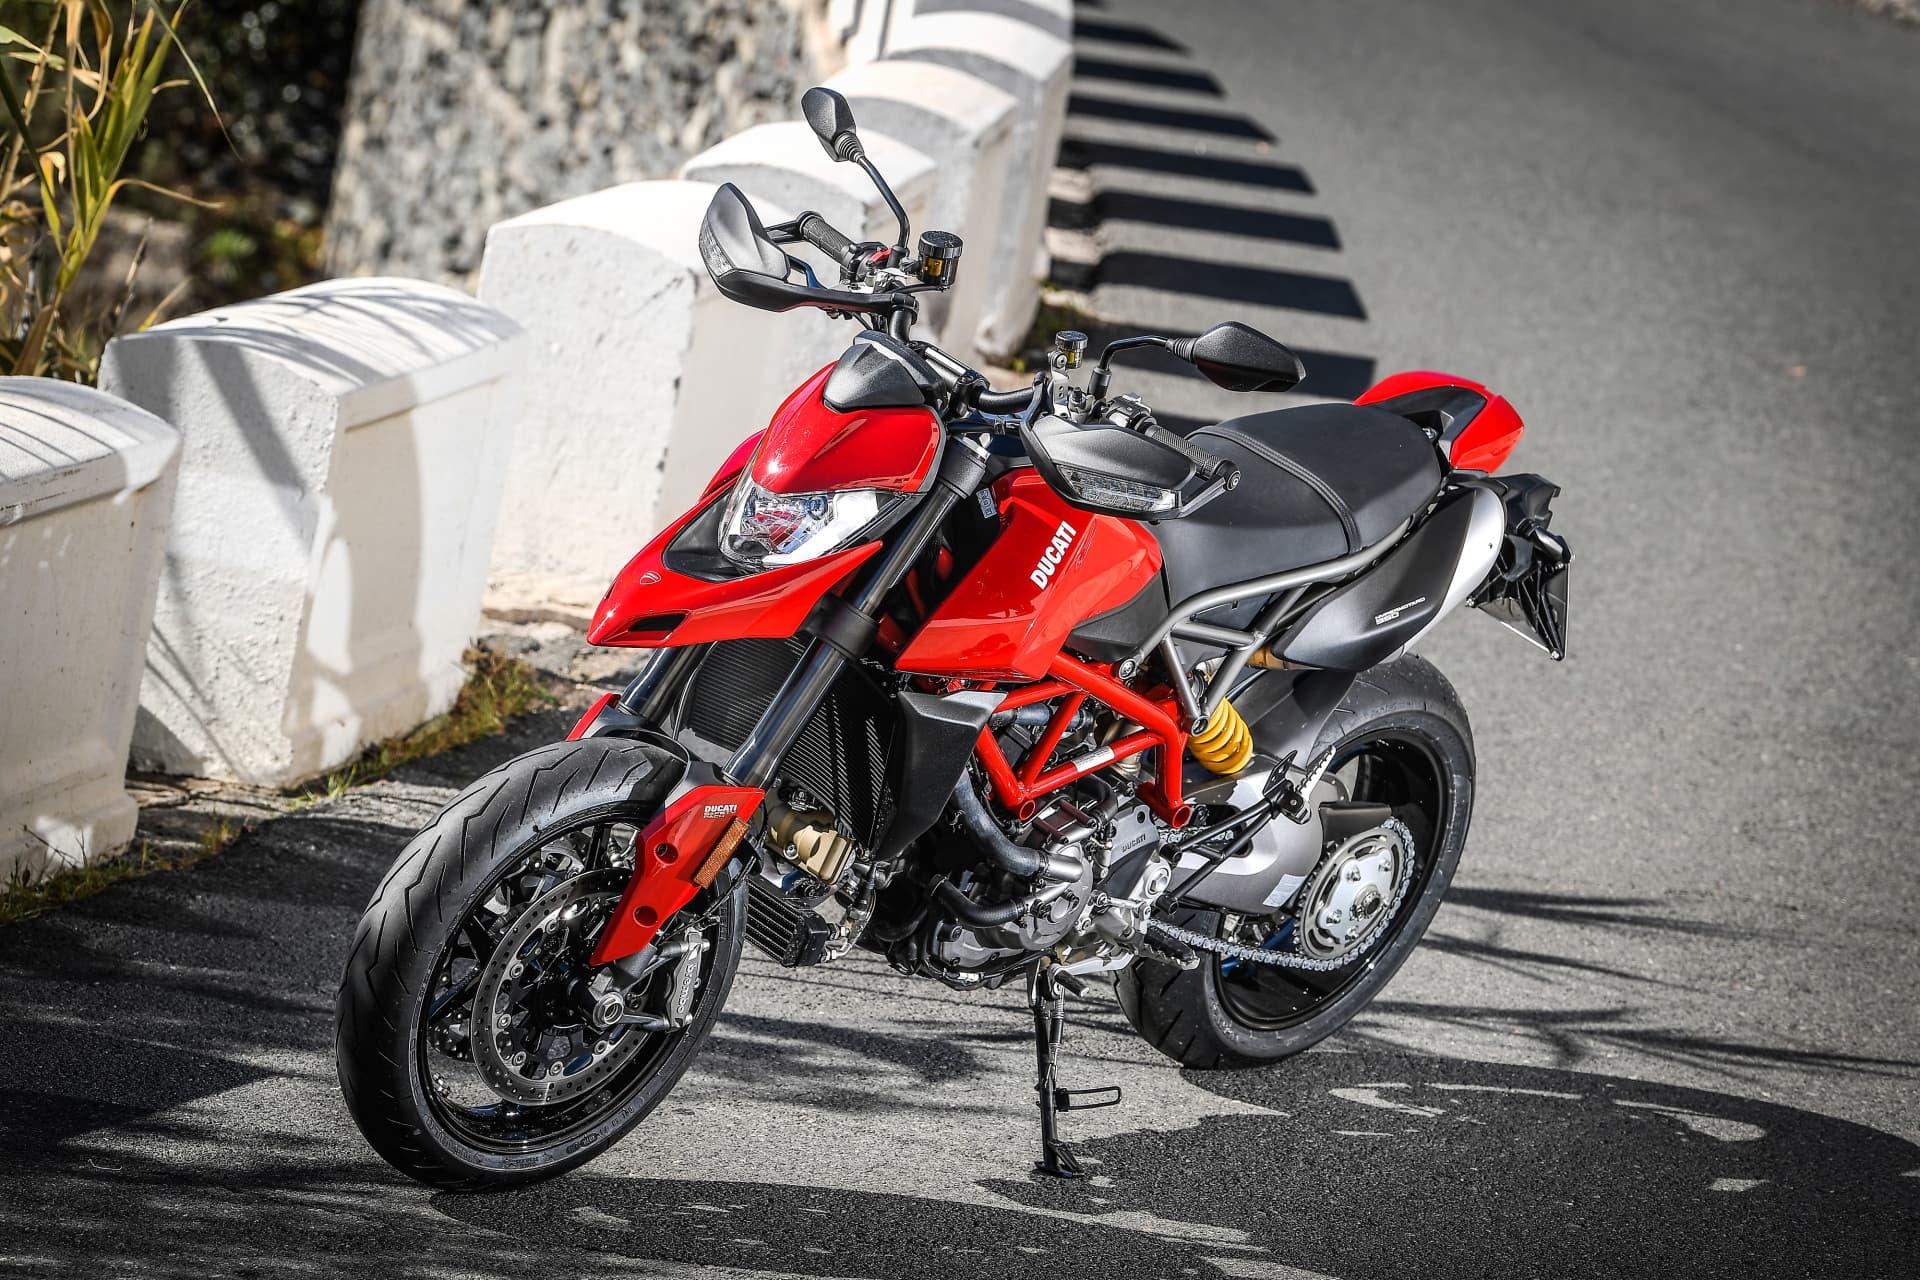 Ducati Hypermotard 950 Static 14 Uc70275 Mid